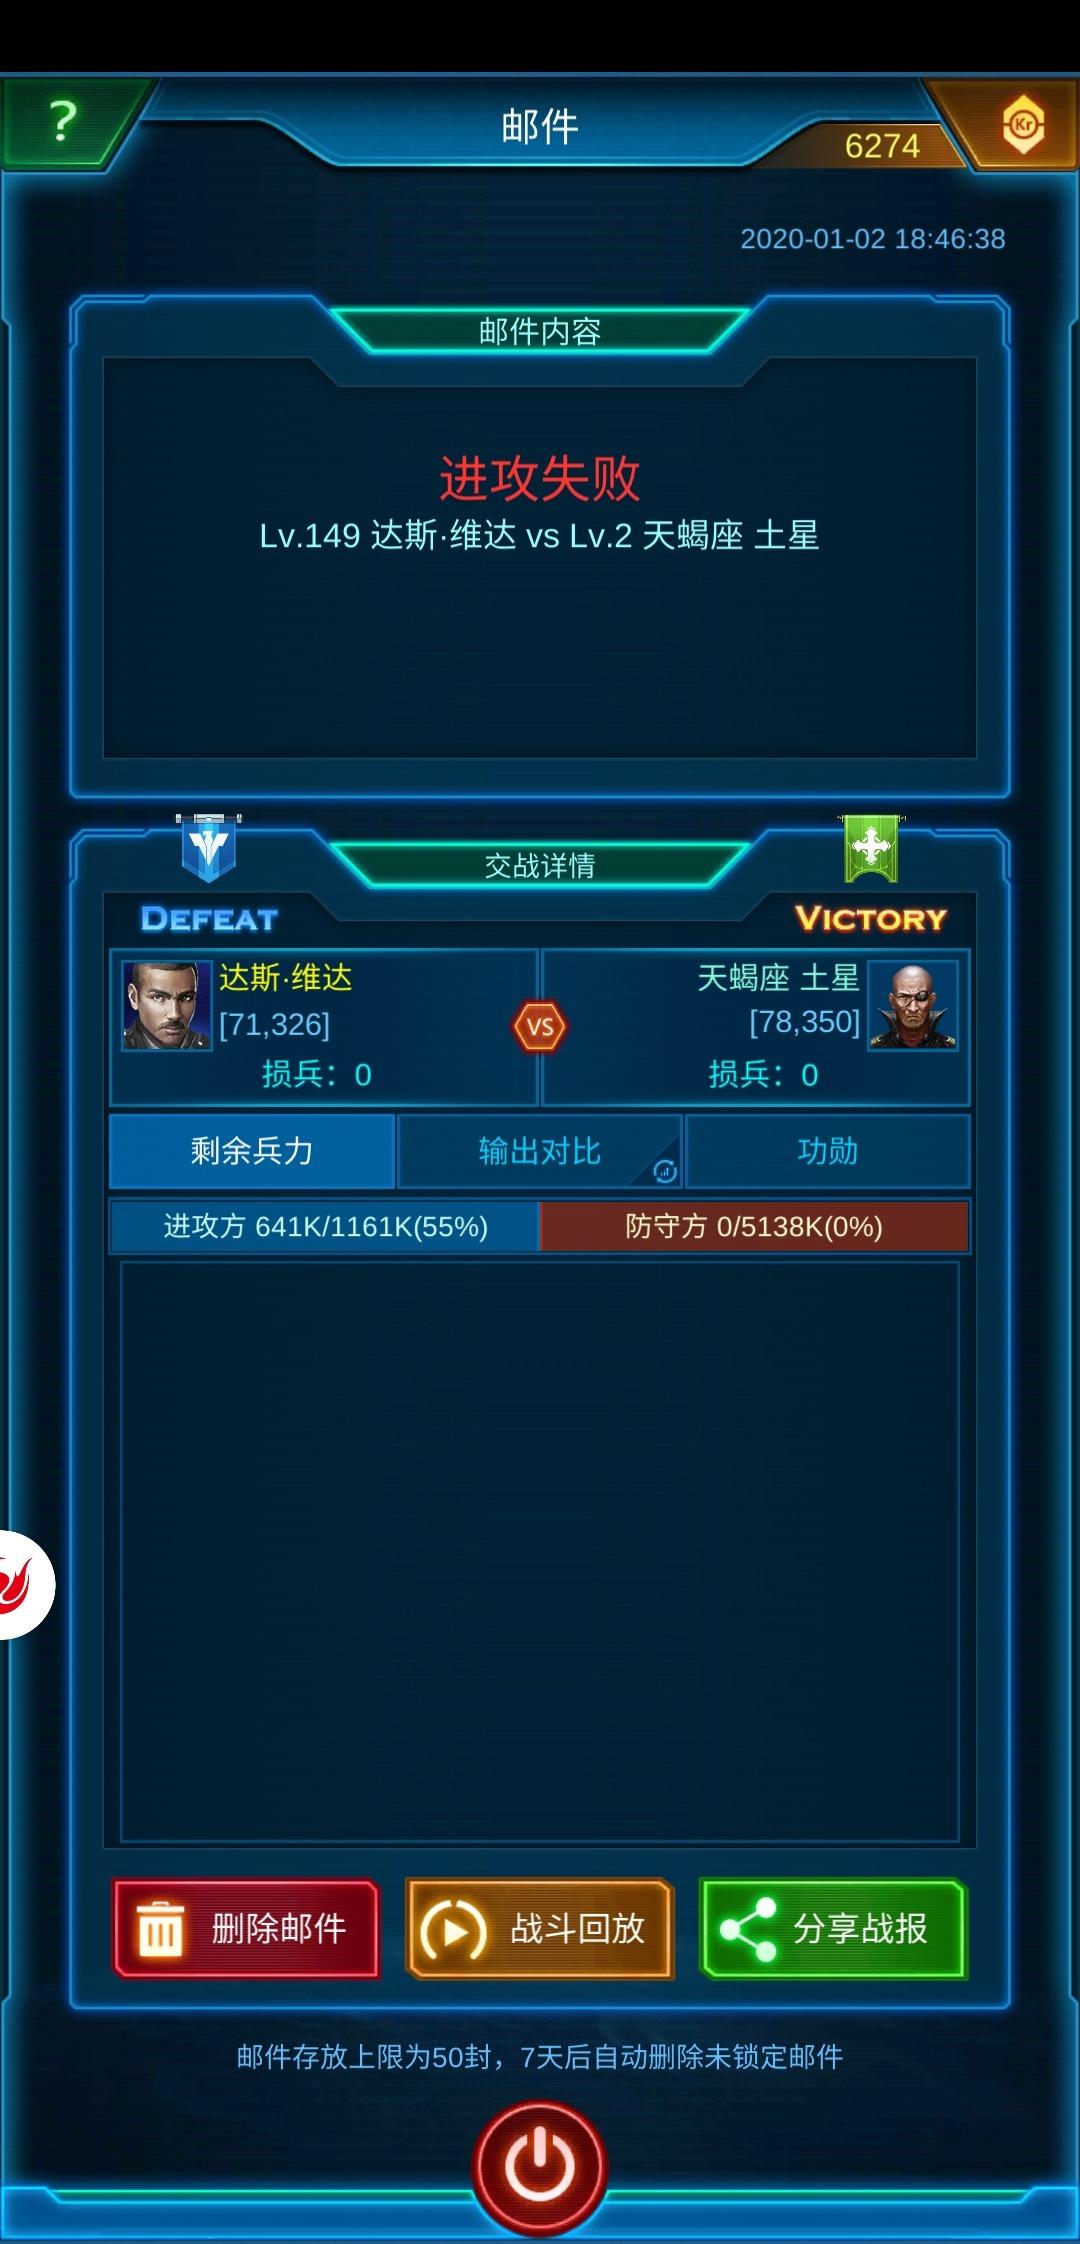 Screenshot_20200102_184821_com.jedigames.p16s.luobo.jpg